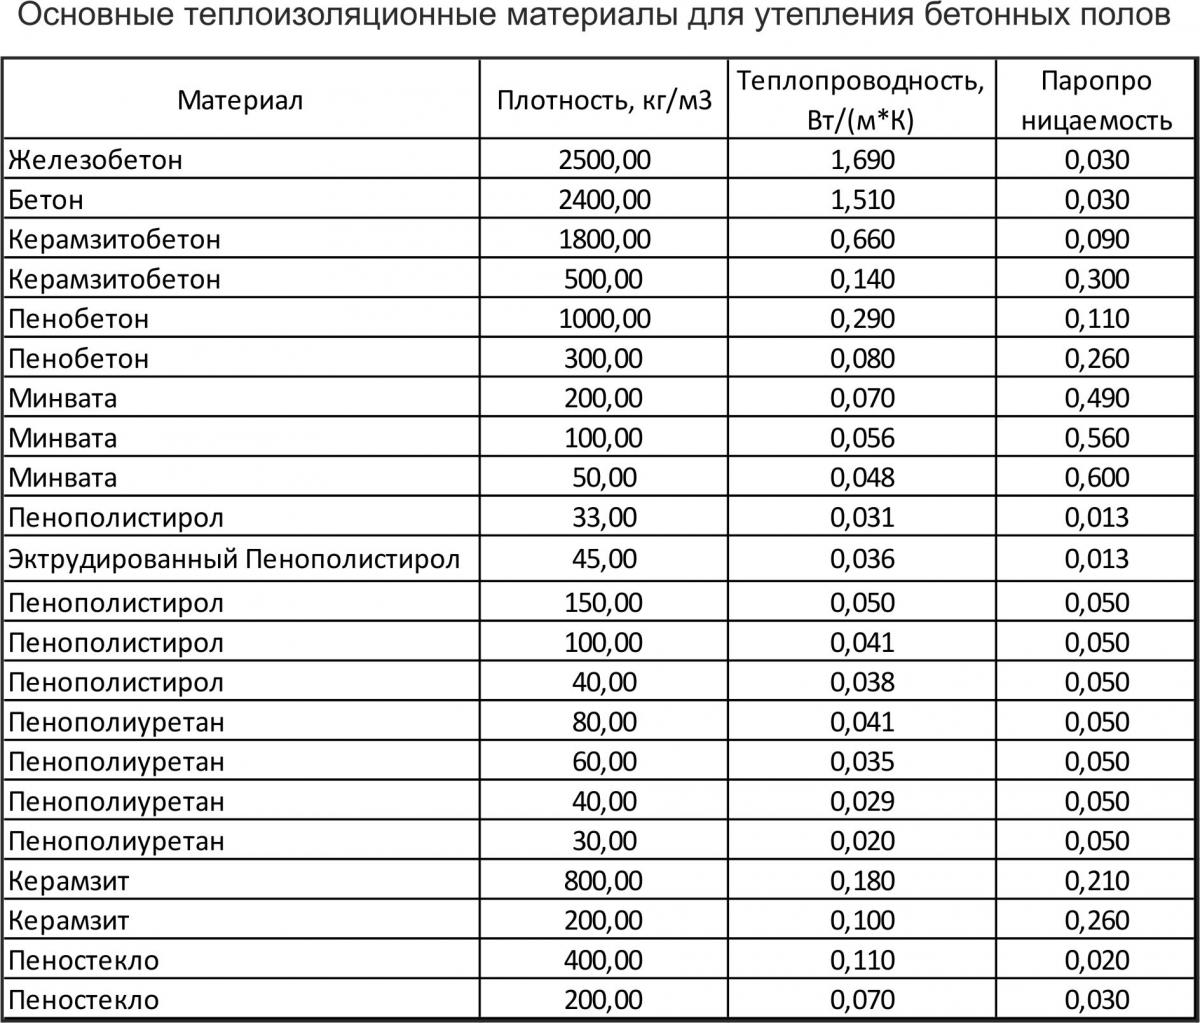 сравнение пенополистирола и керамзита